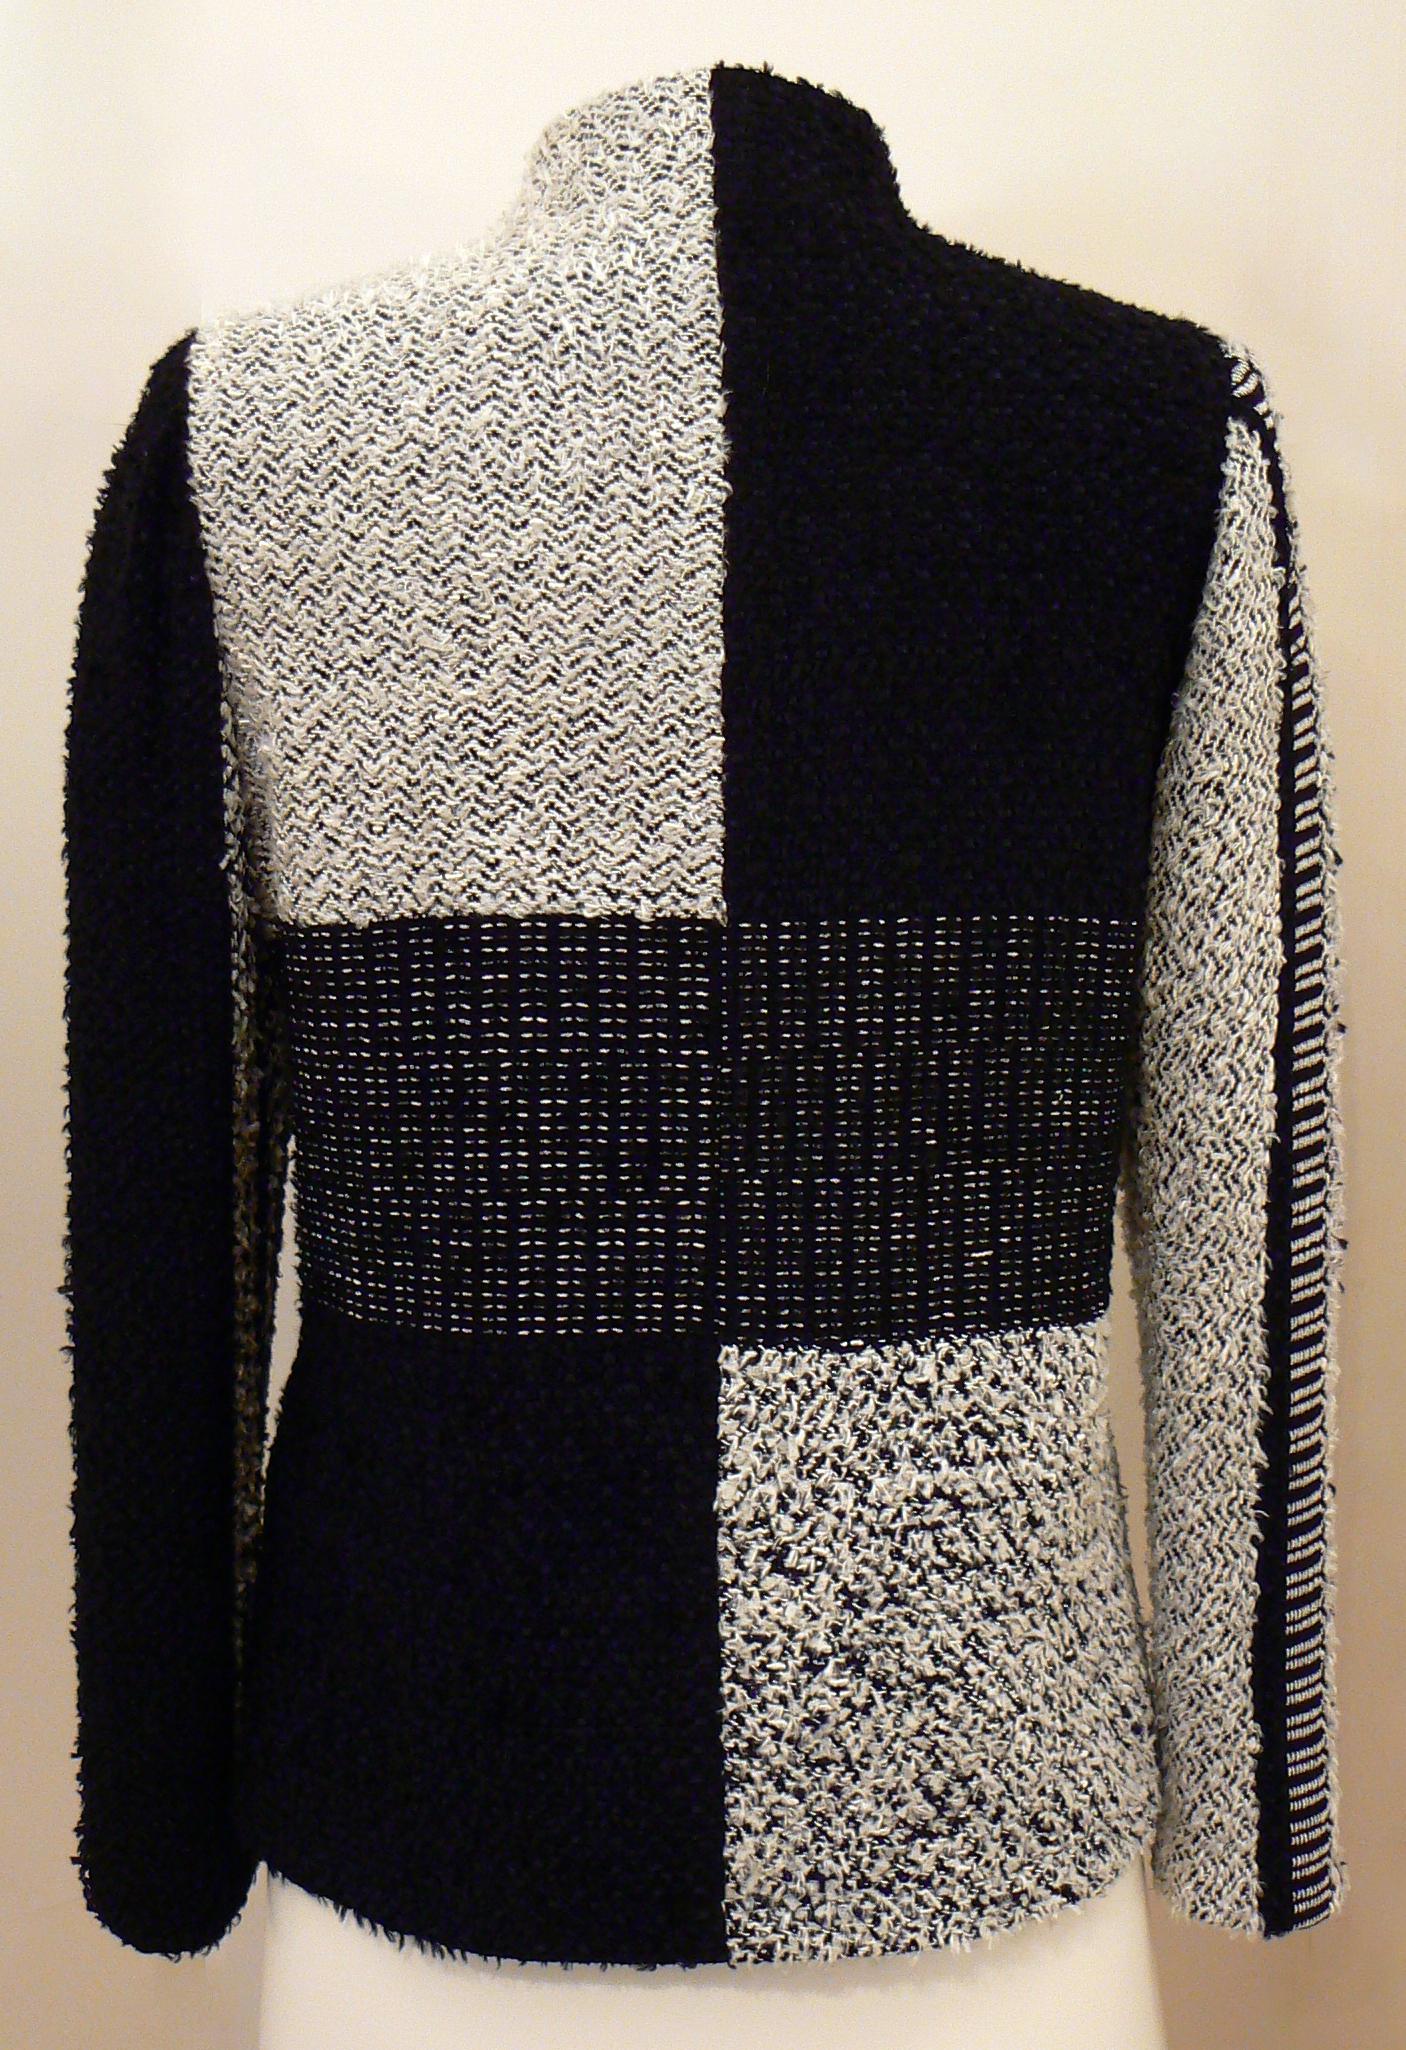 Handwoven Clothing, Jacket, Kathleen Weir-West, 17-002.JPG